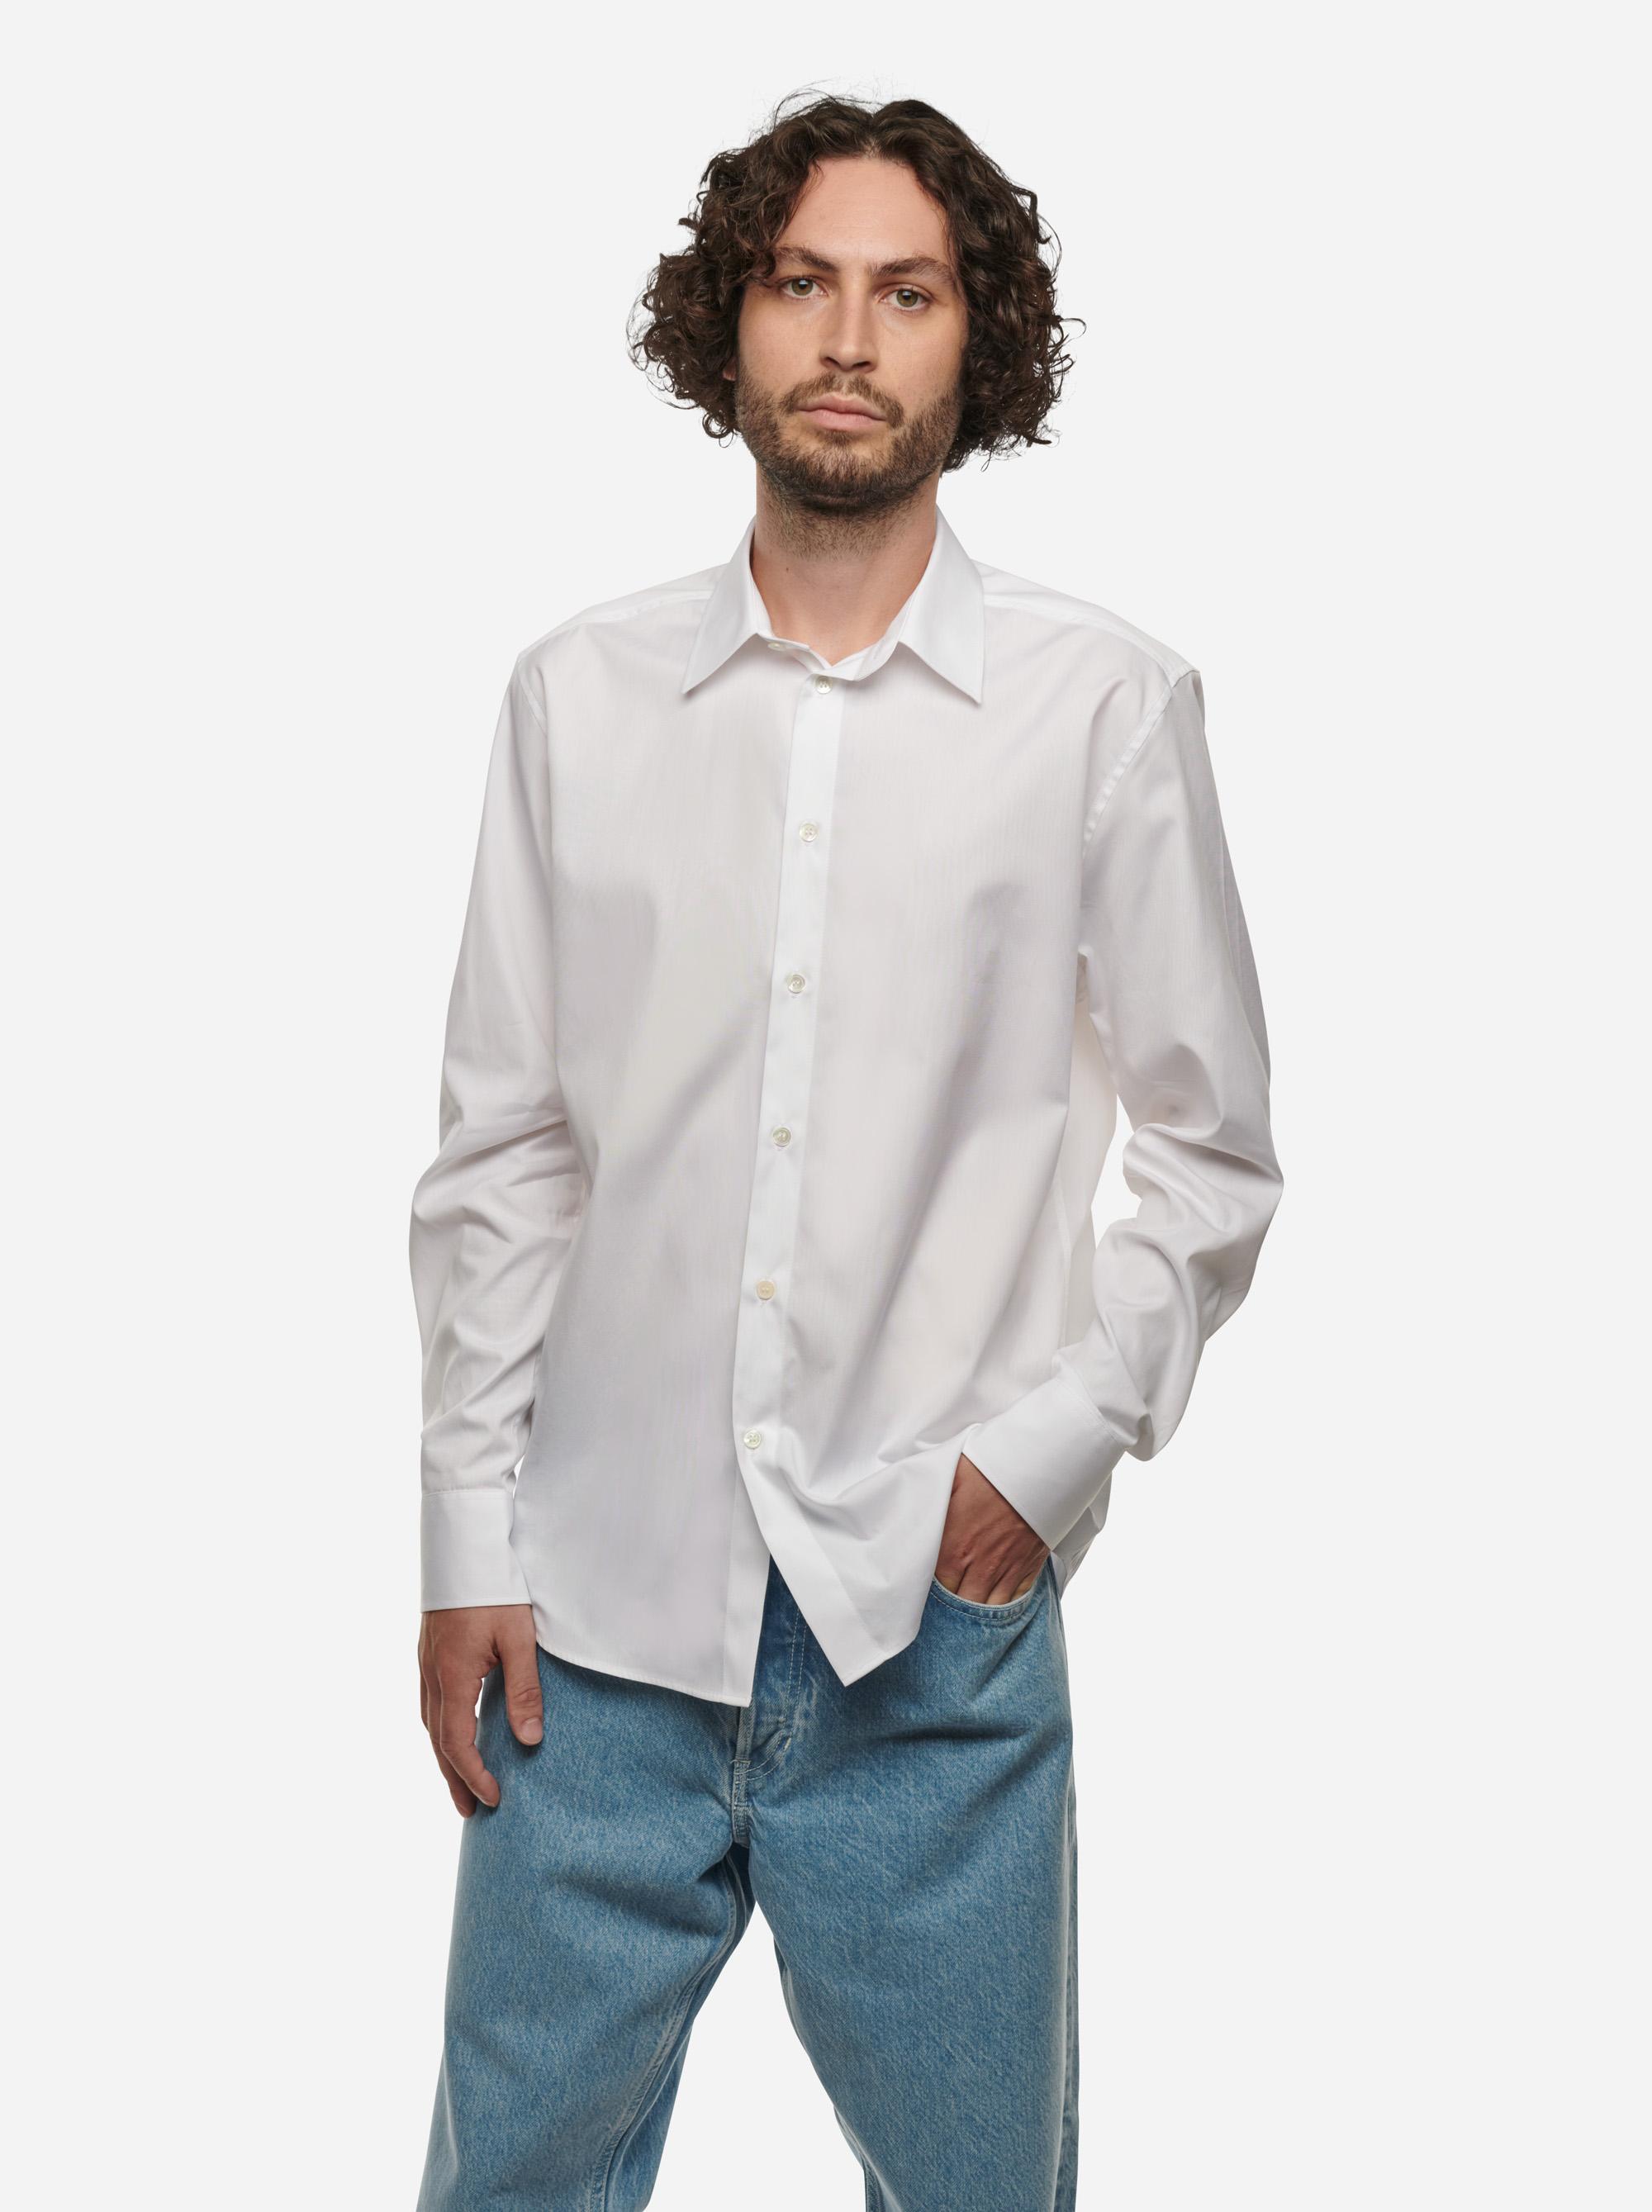 Teym - The Shirt - Men - White - 1